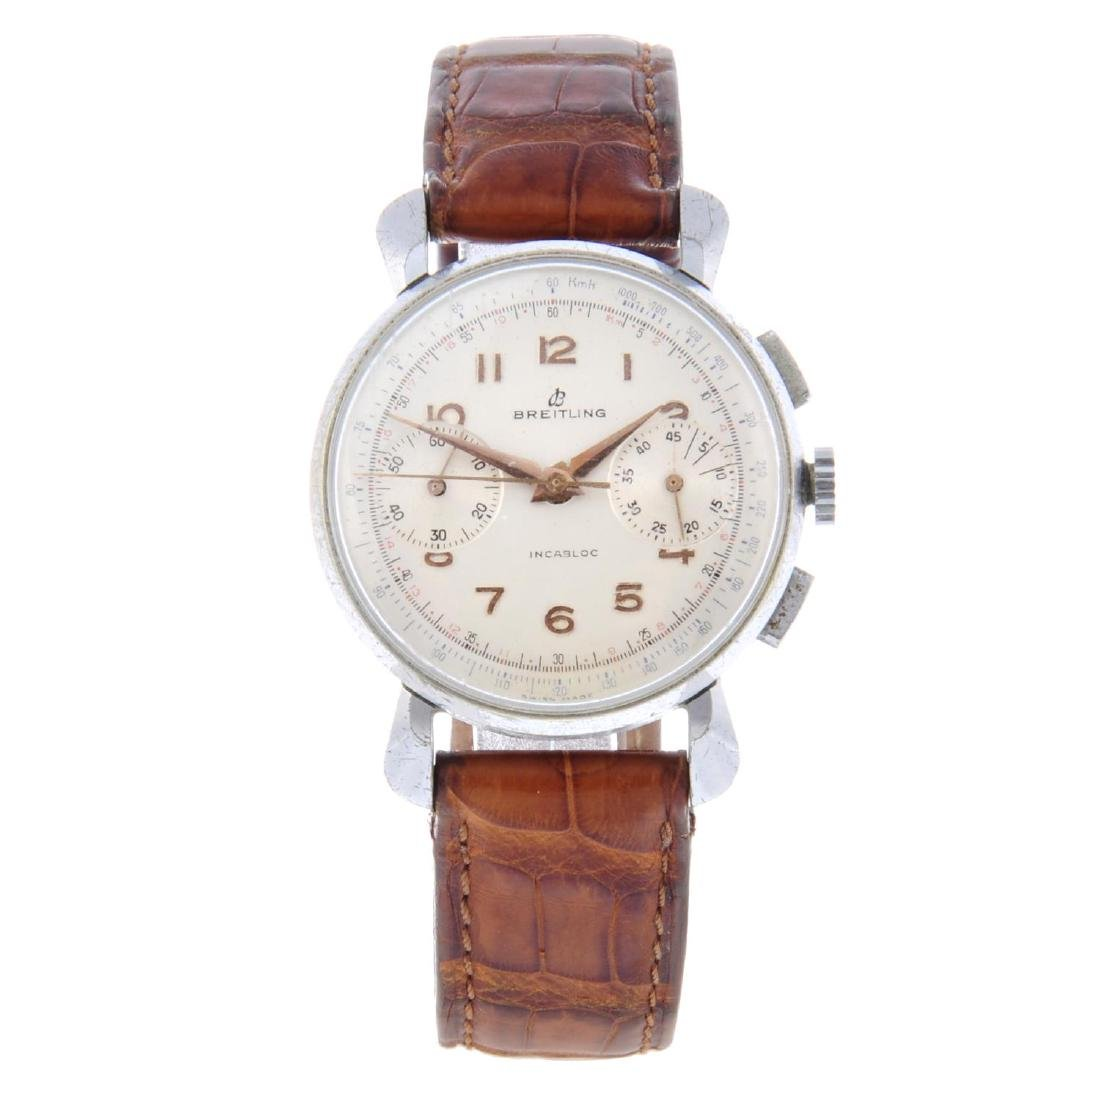 BREITLING - a gentleman's chronograph wrist watch.